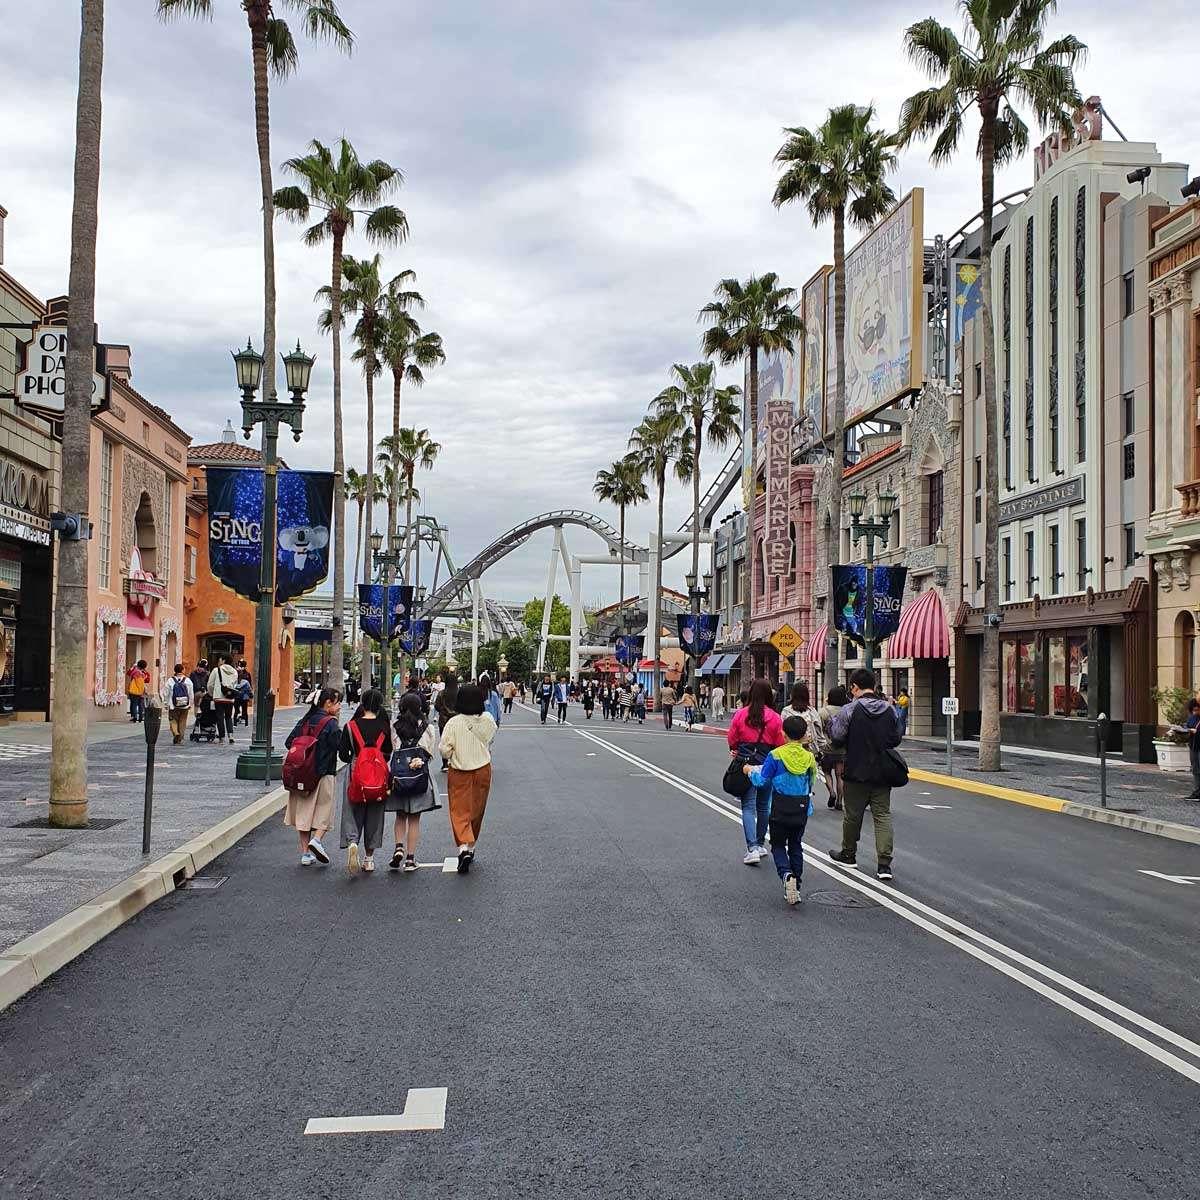 Looking down Hollywood Boulevard